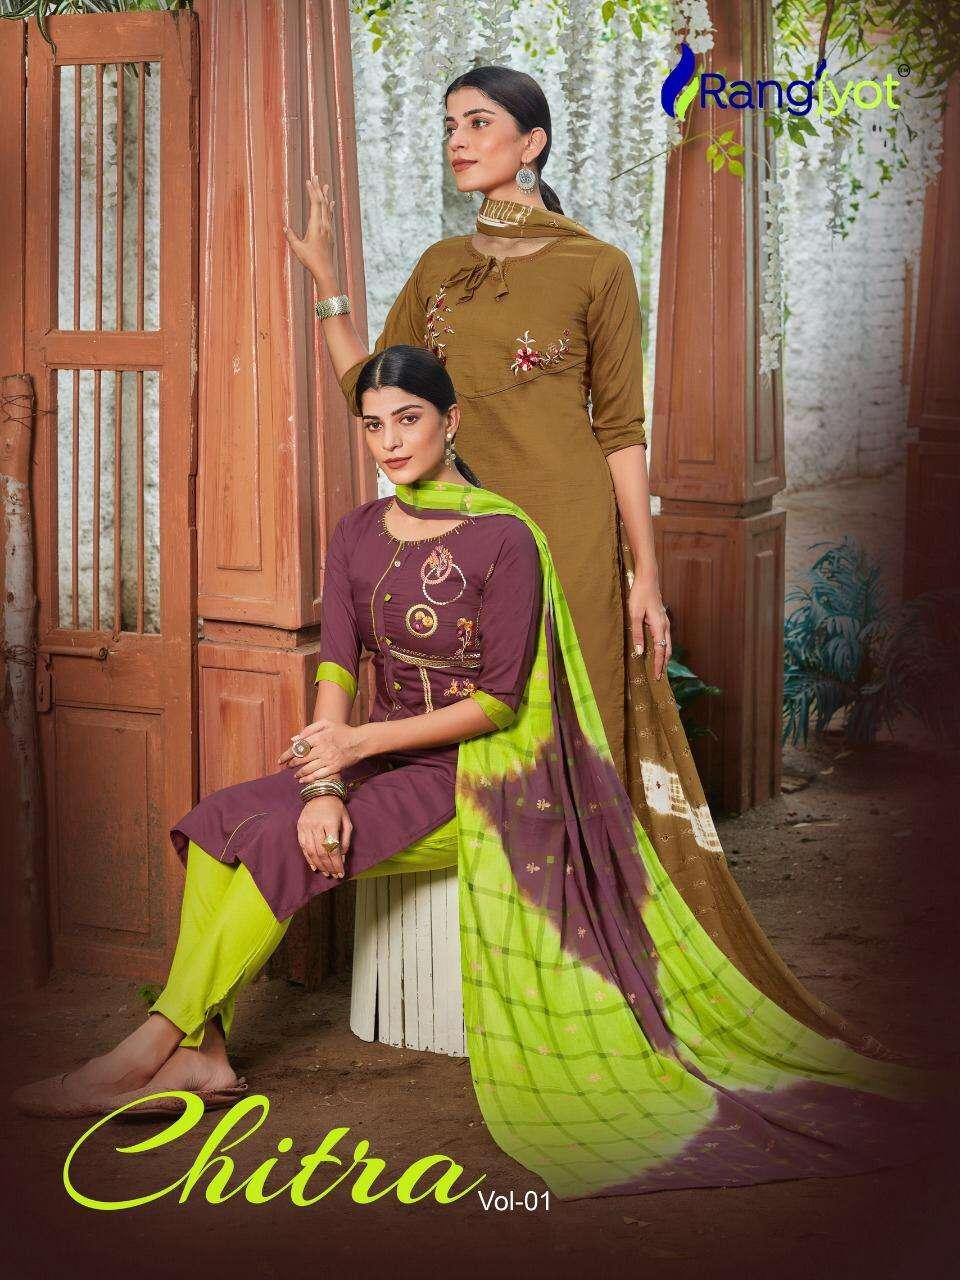 Rangjyot Chaitra Vol 1 Exclusive 3 Piece Set New Catalog Wholesaler